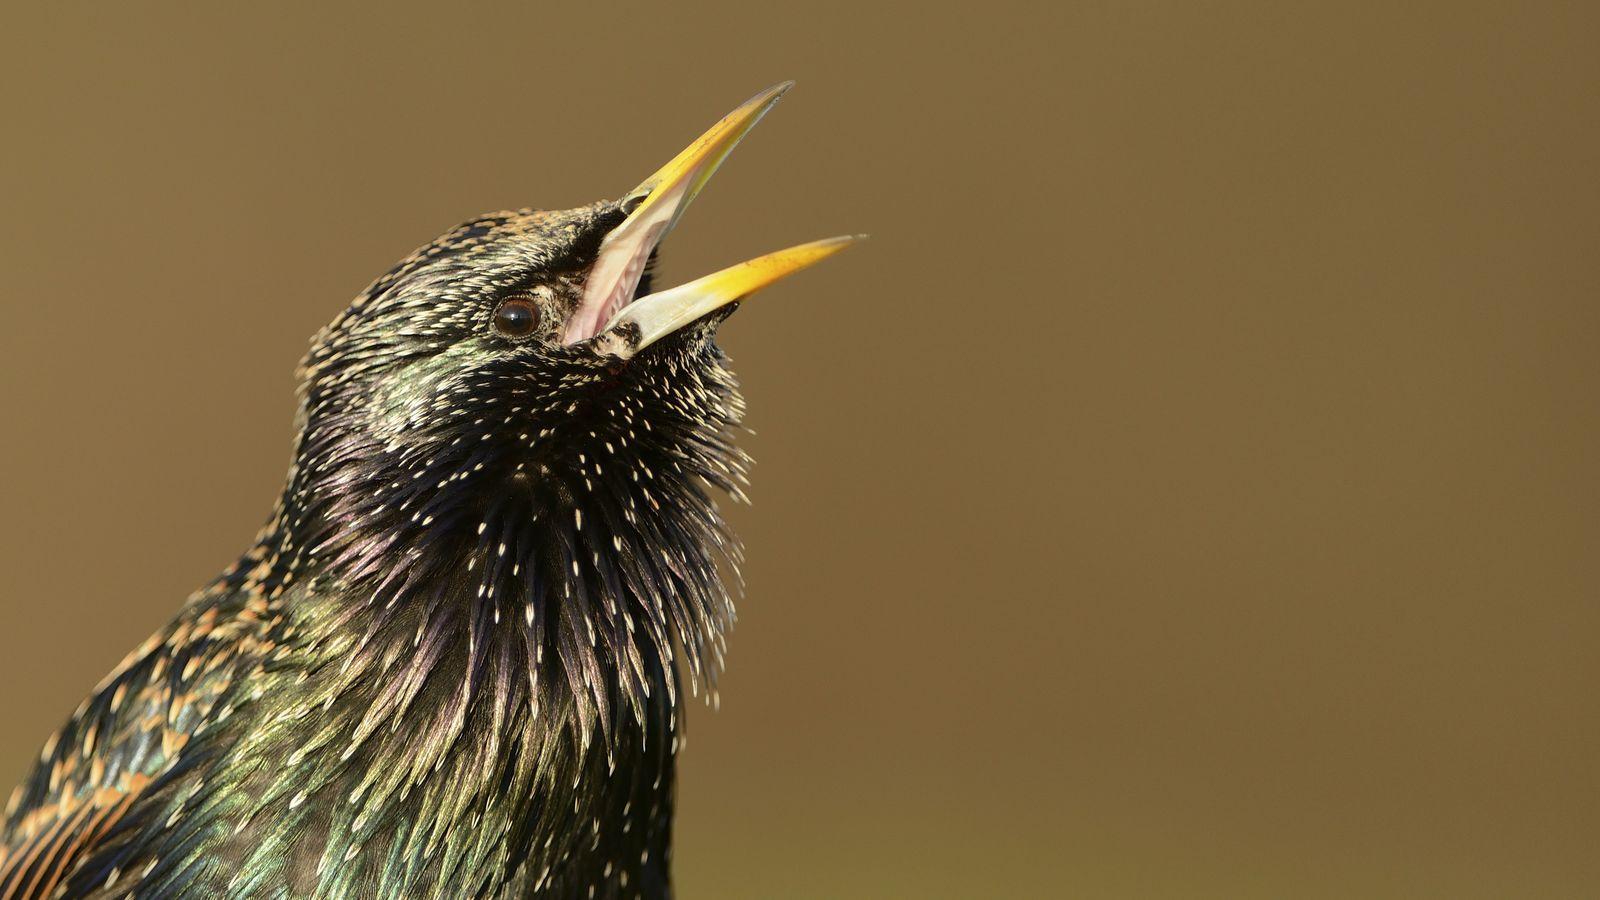 The starling, 'Sturnus vulgaris', has glossy green and purple feathers.